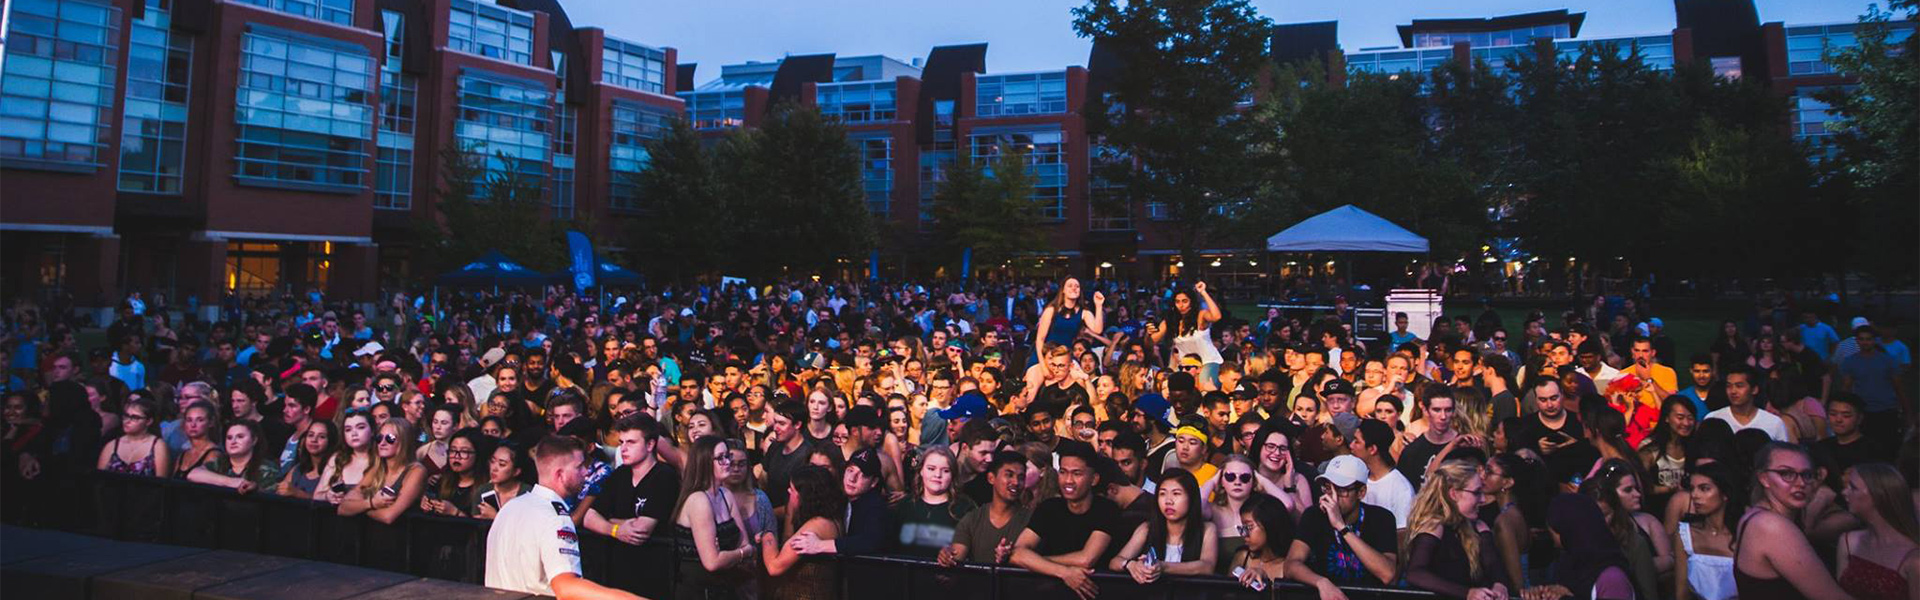 Concert on campus